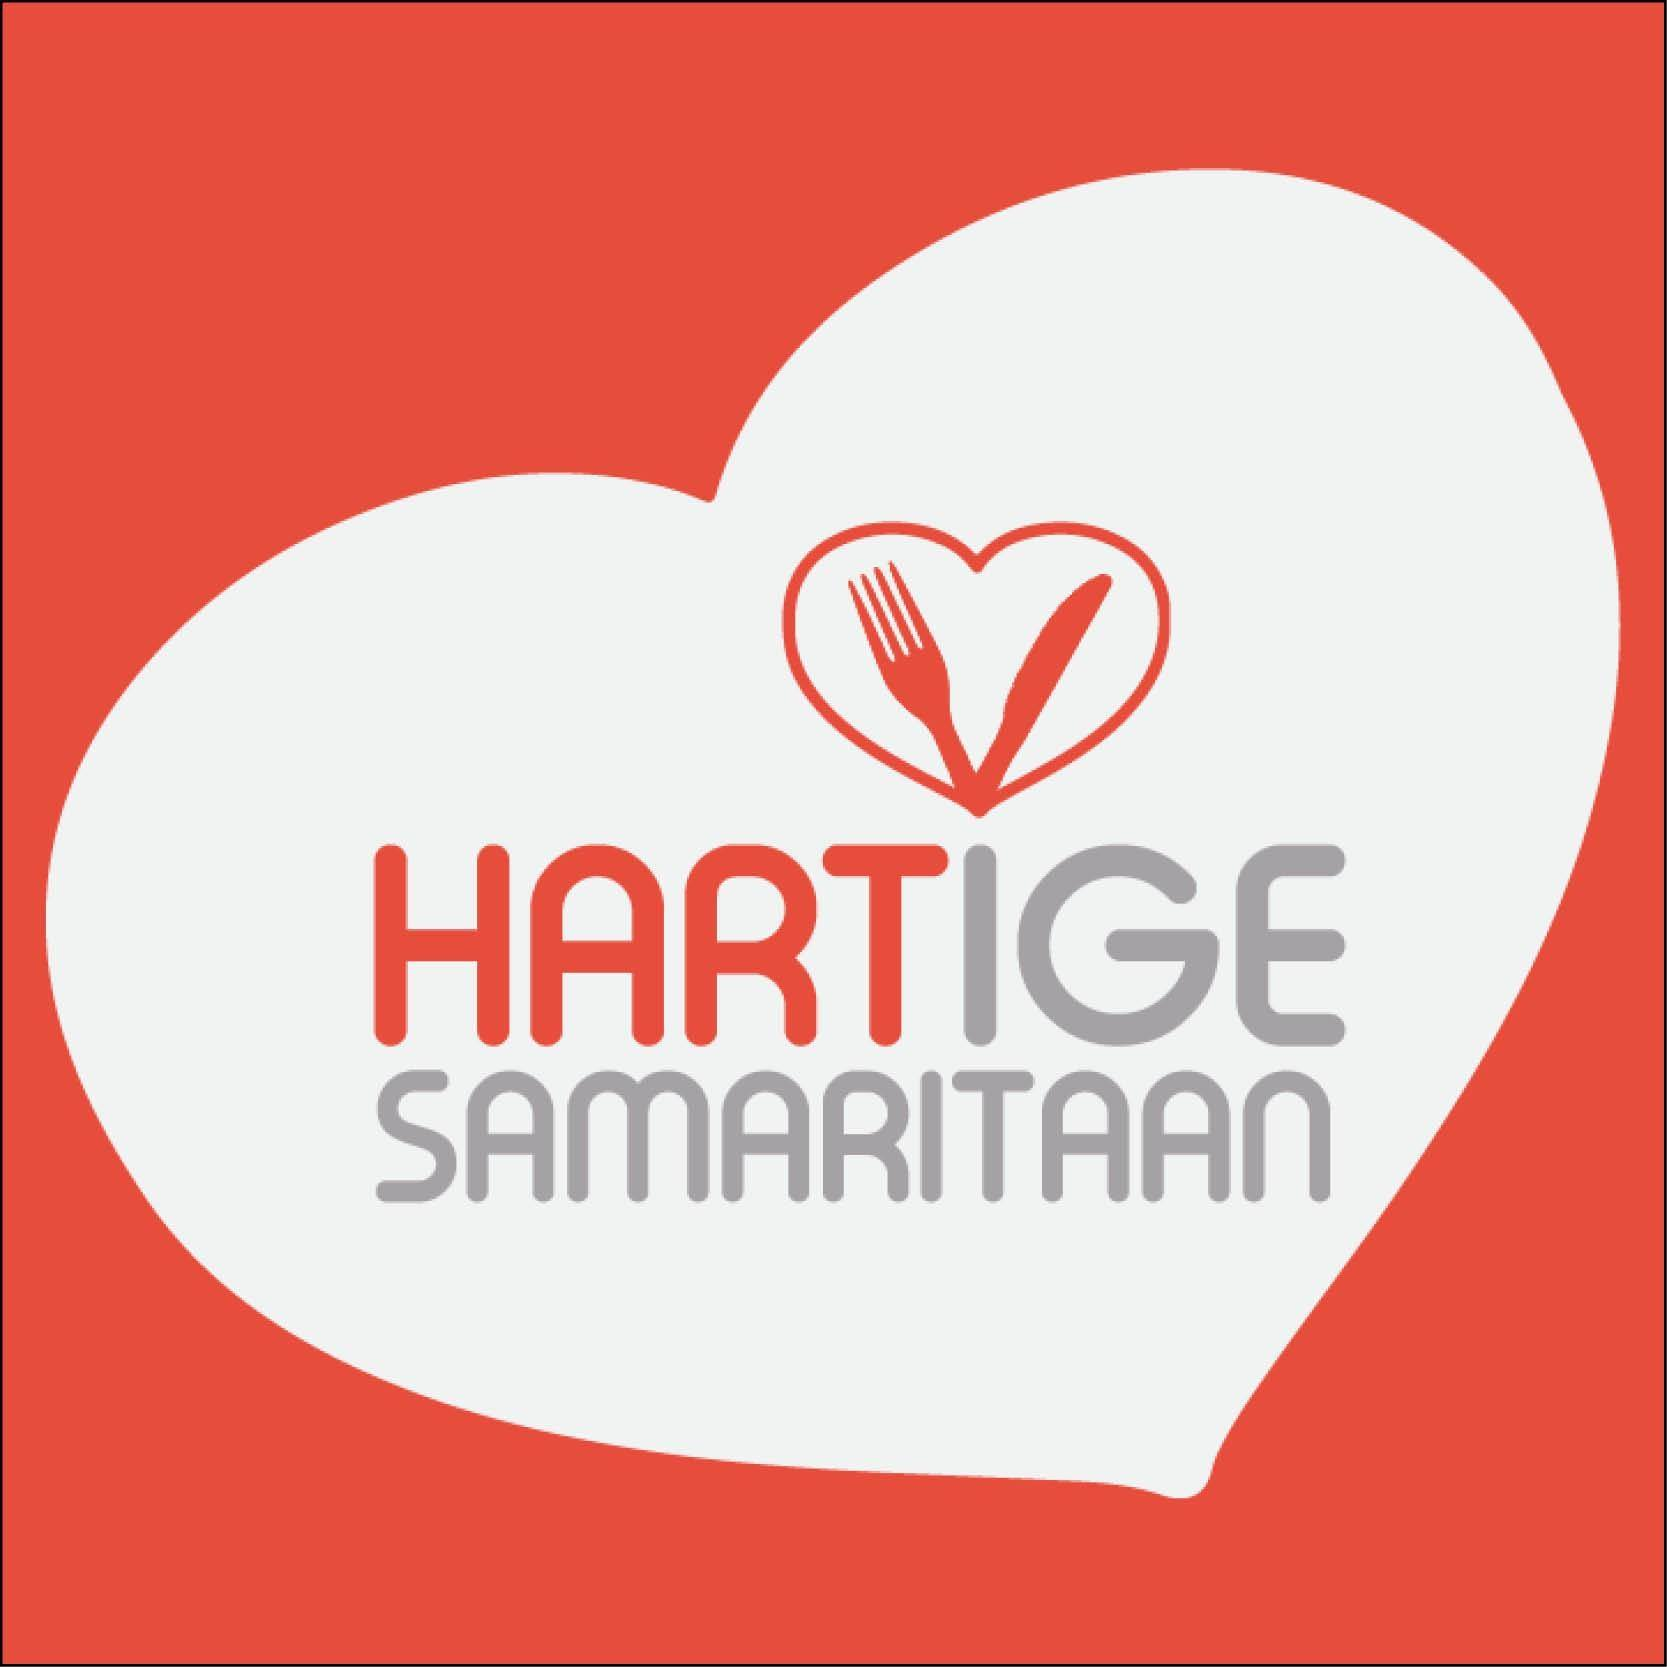 Logo Hartige Samaritaan